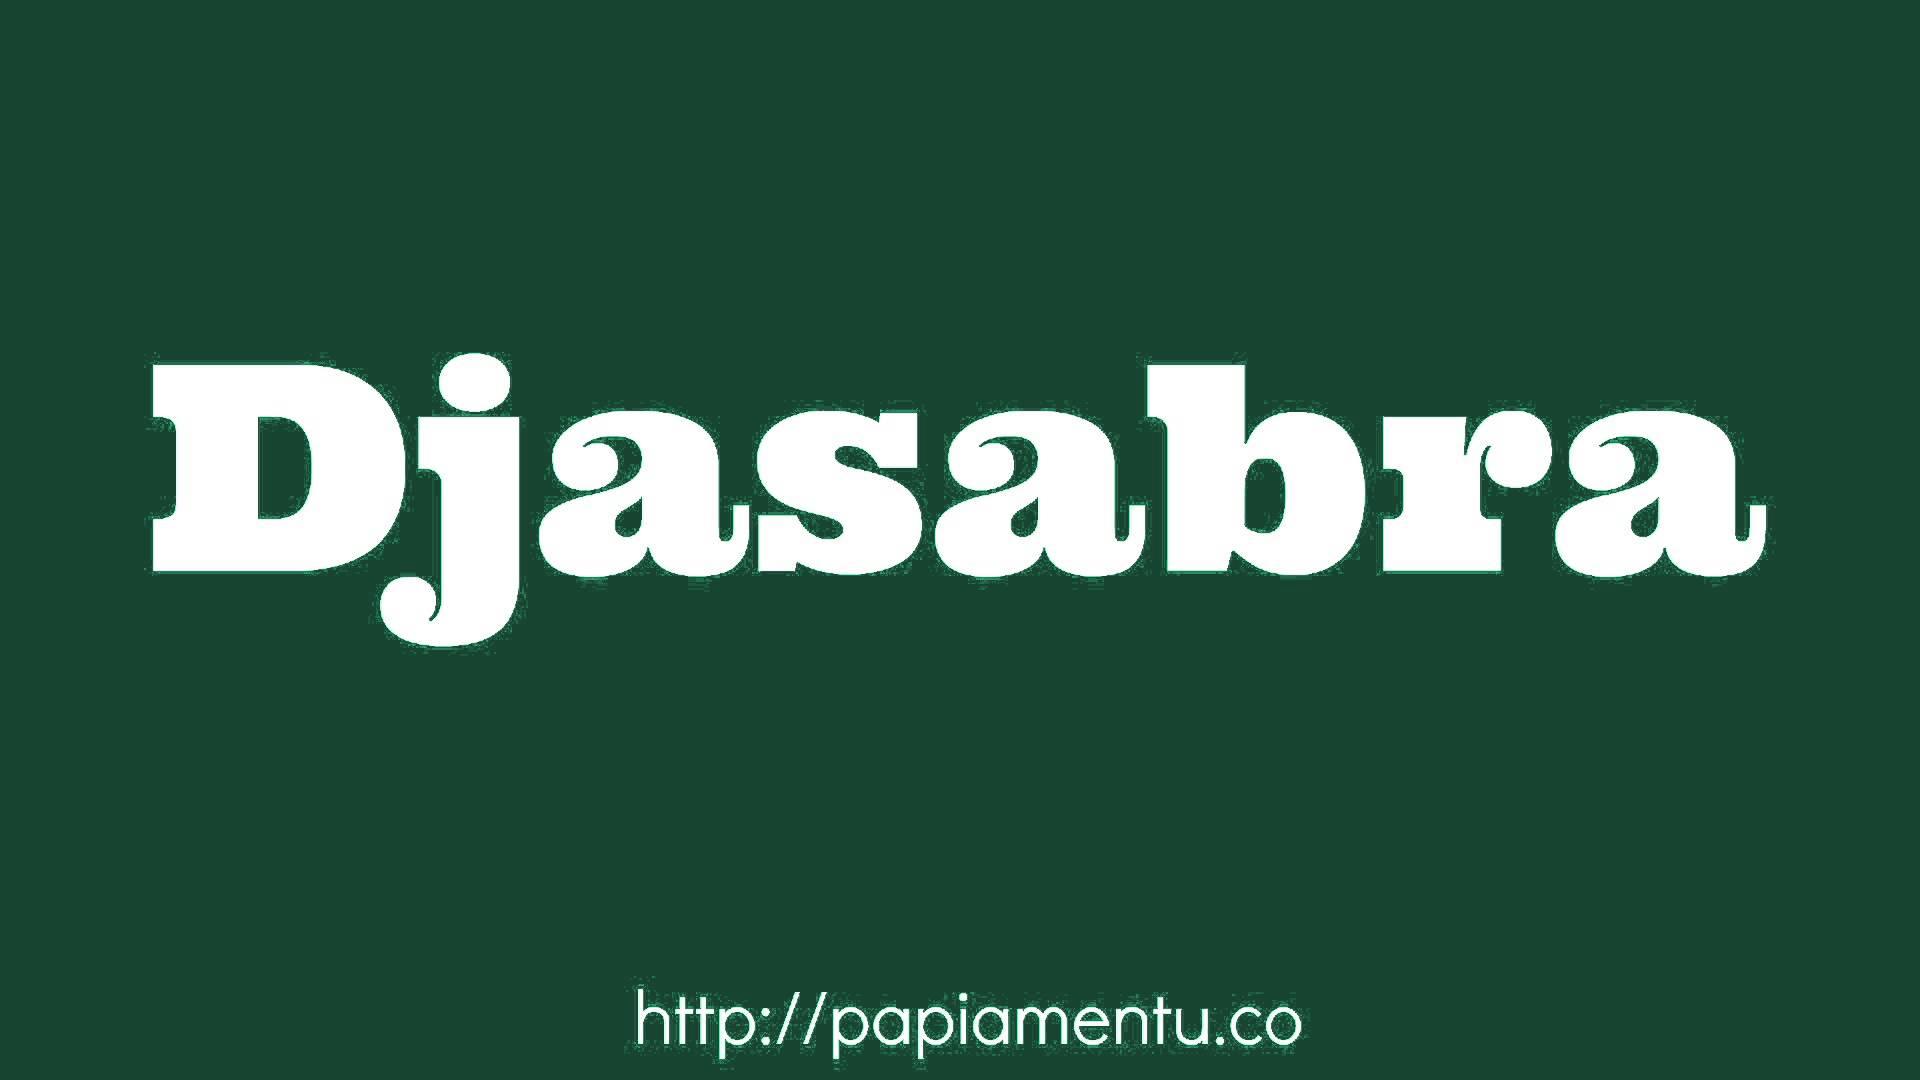 Zo zeg je Djasabra (Zaterdag) In Papiamentu